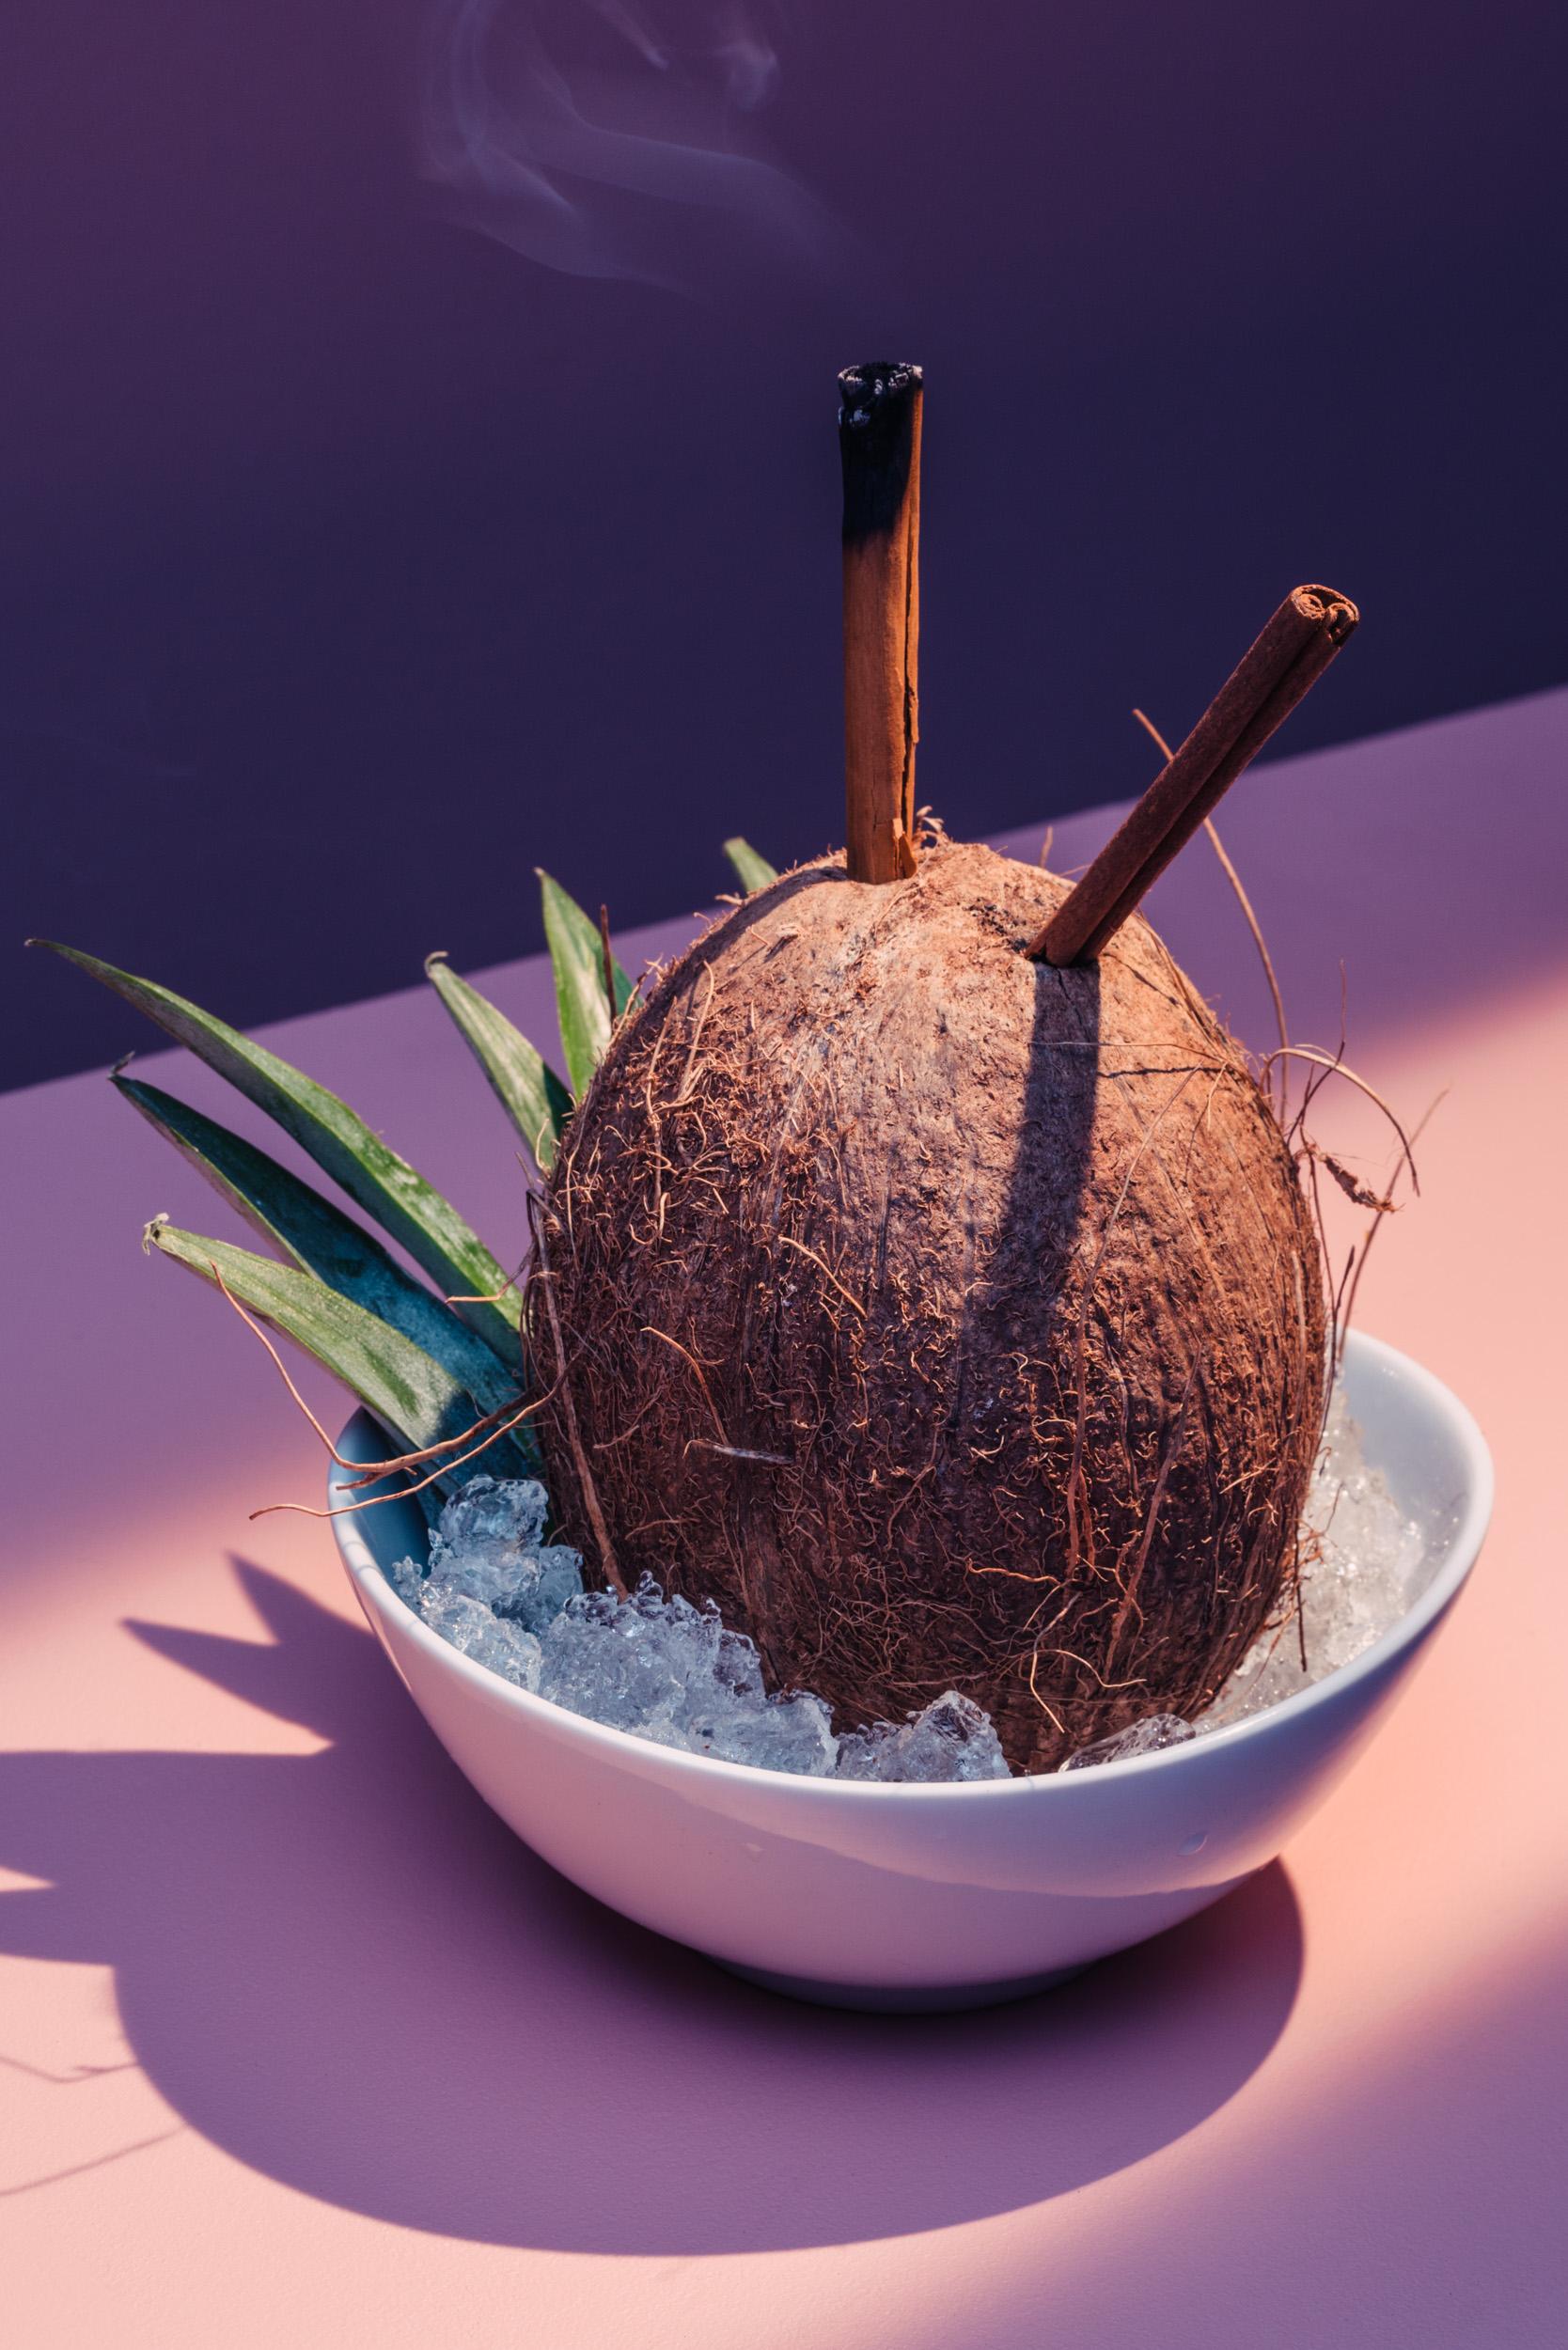 sugar-east-smoked-cinnamon-coconut-cocktail-196-portrait.jpg